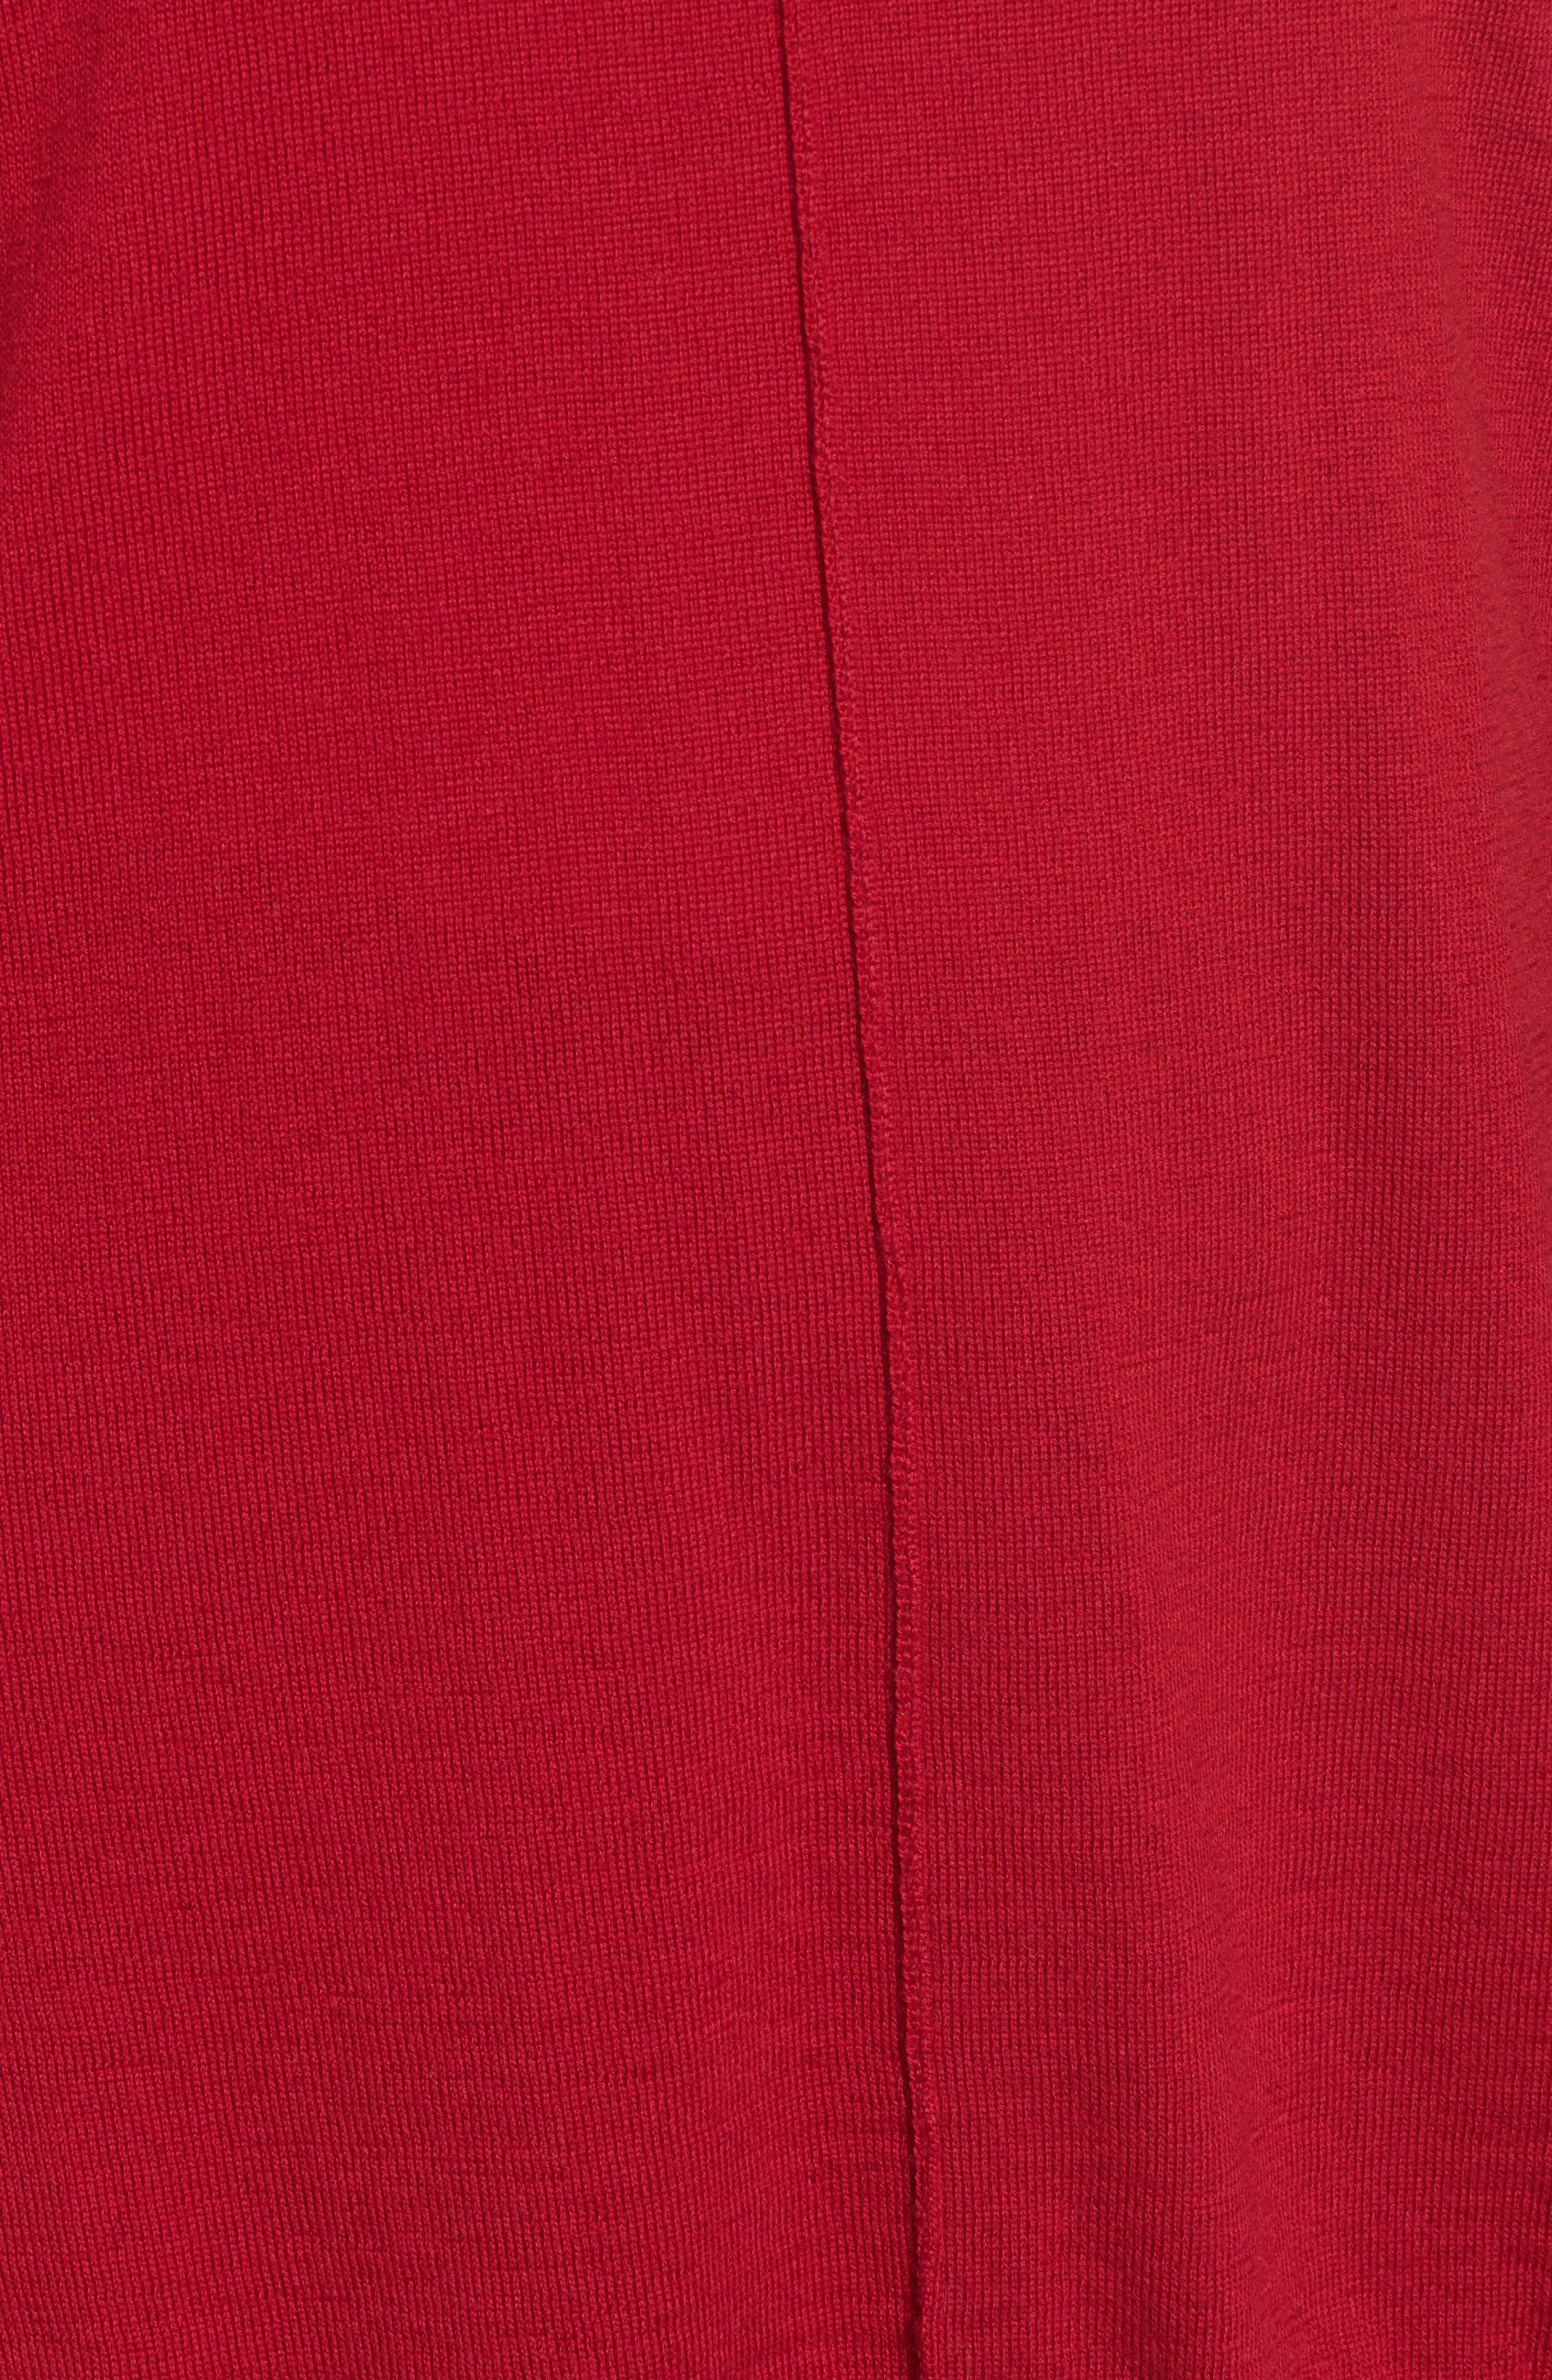 Merino Wool Boxy Turtleneck Sweater,                             Alternate thumbnail 30, color,